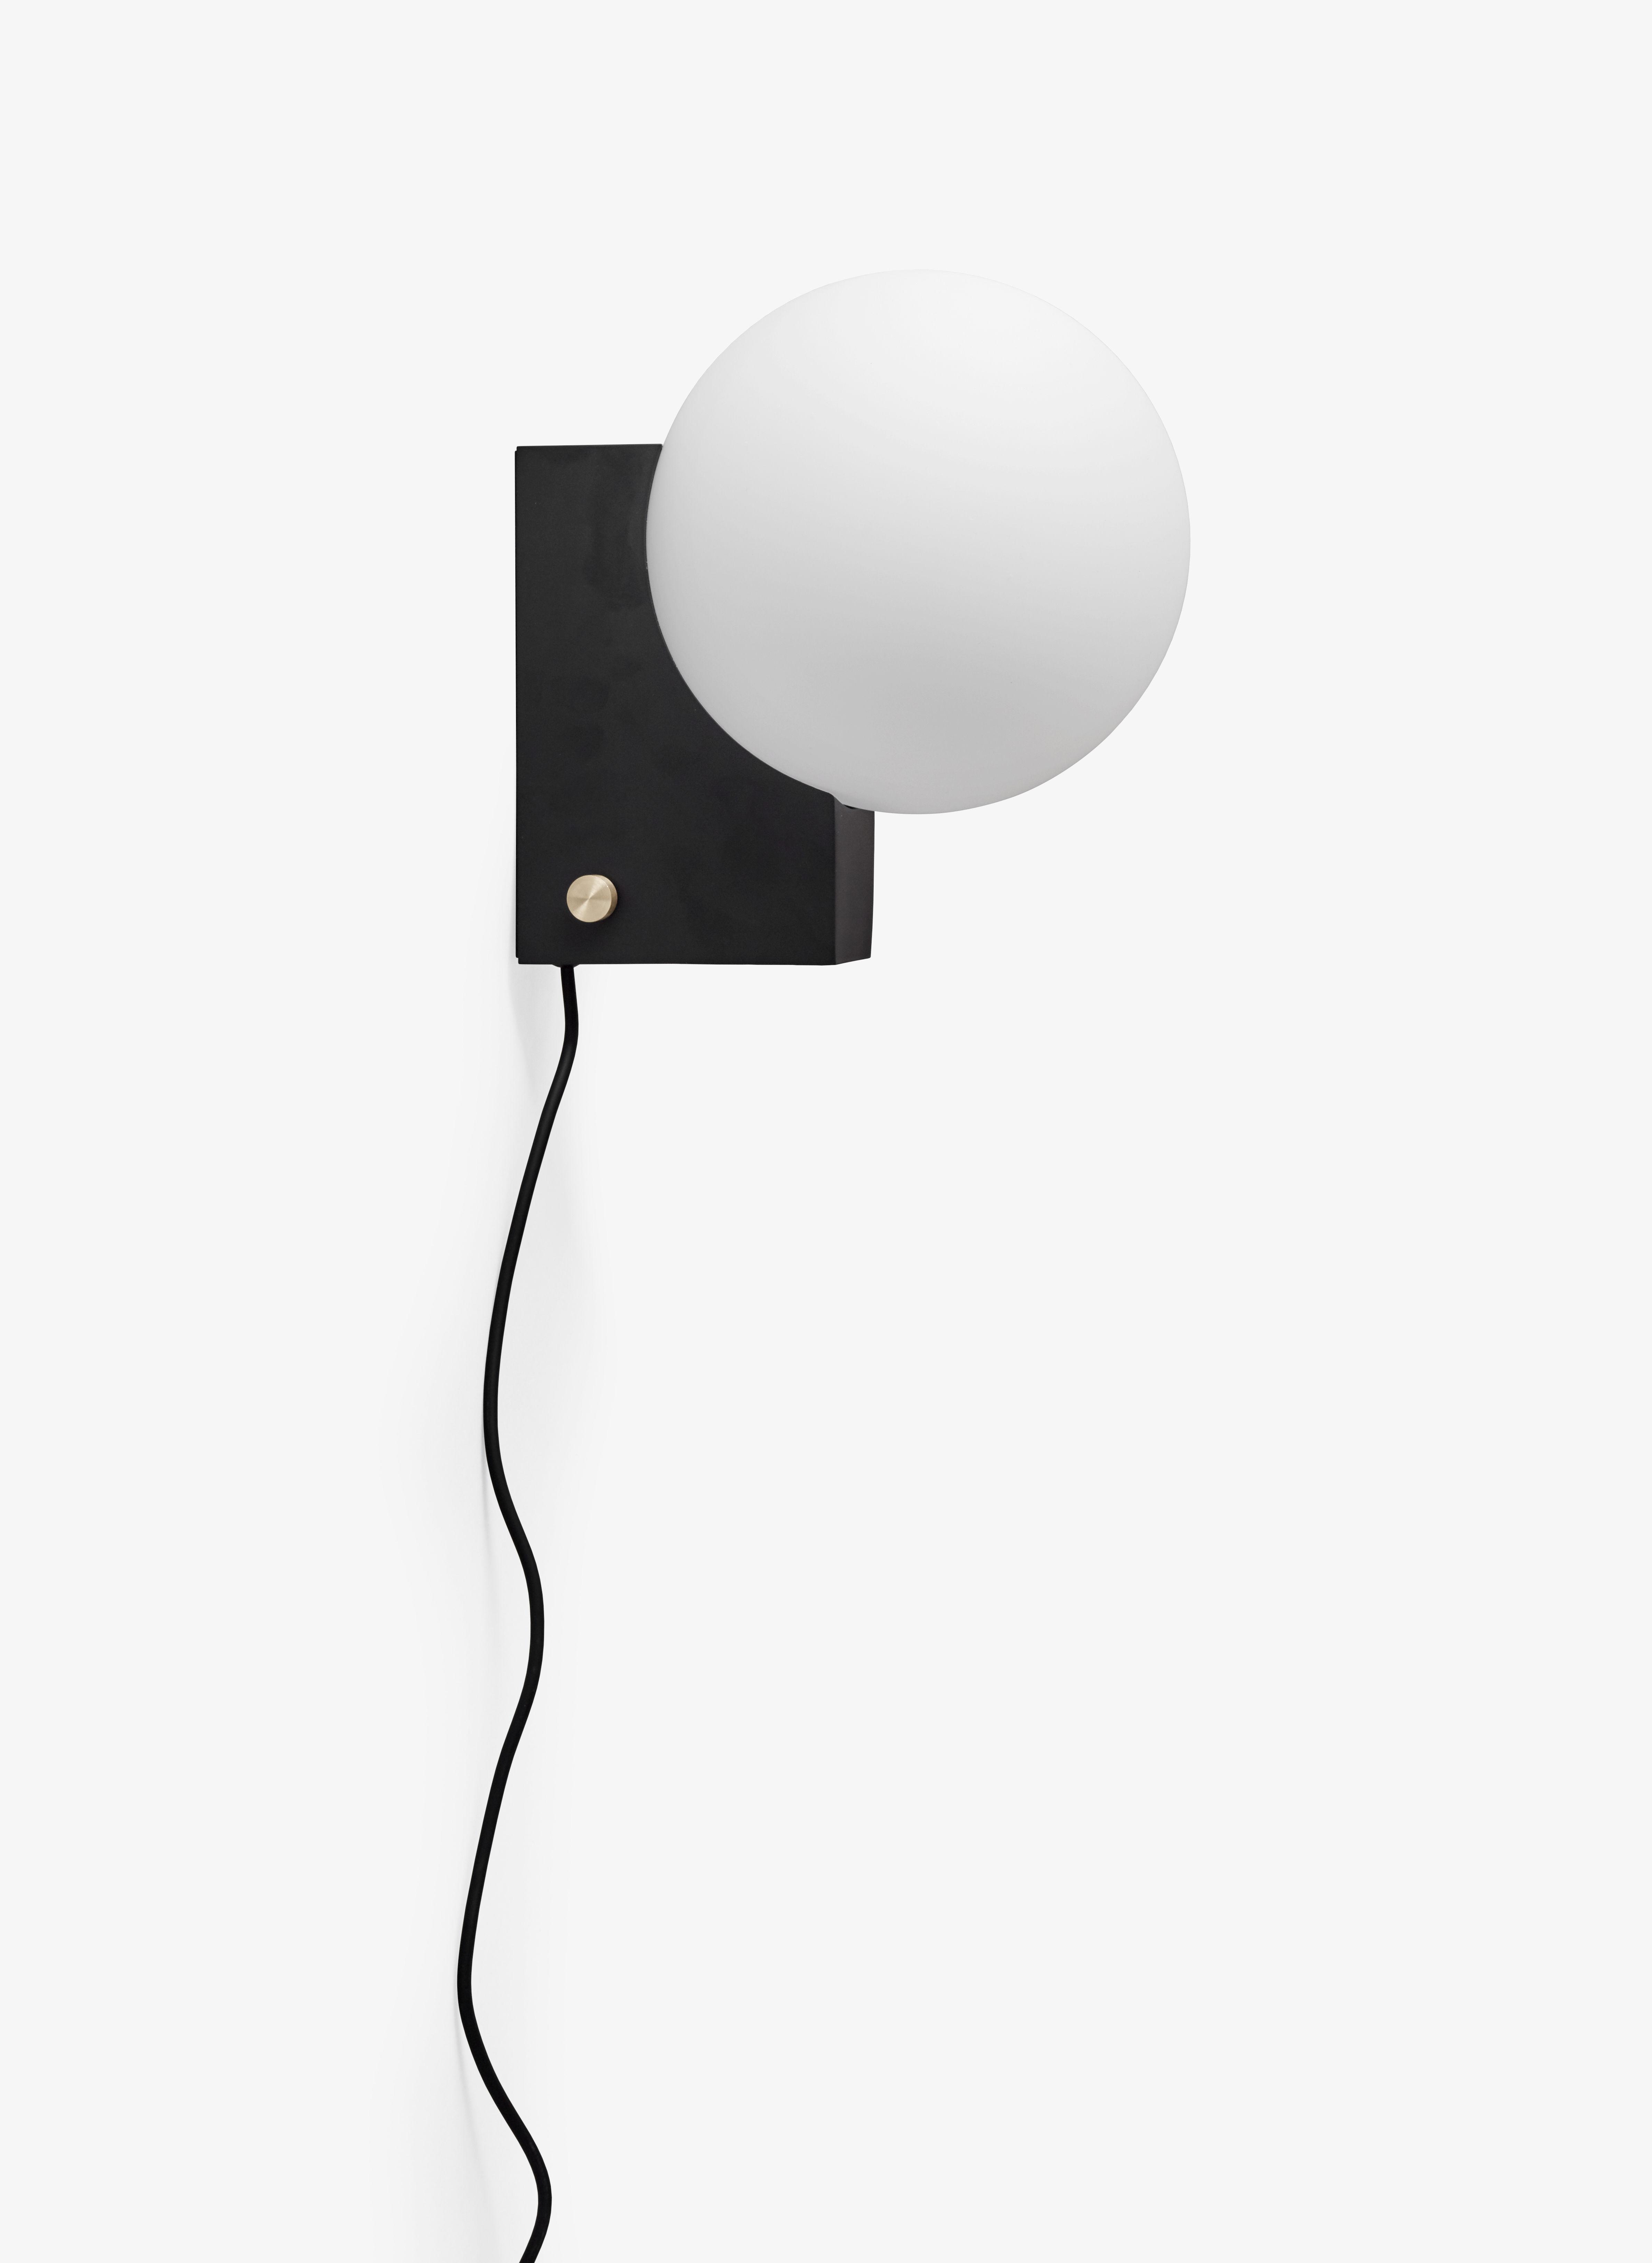 Shy1 Table Lampe Cmamp;tradition 24 Applique De Journey H by67Yfgv